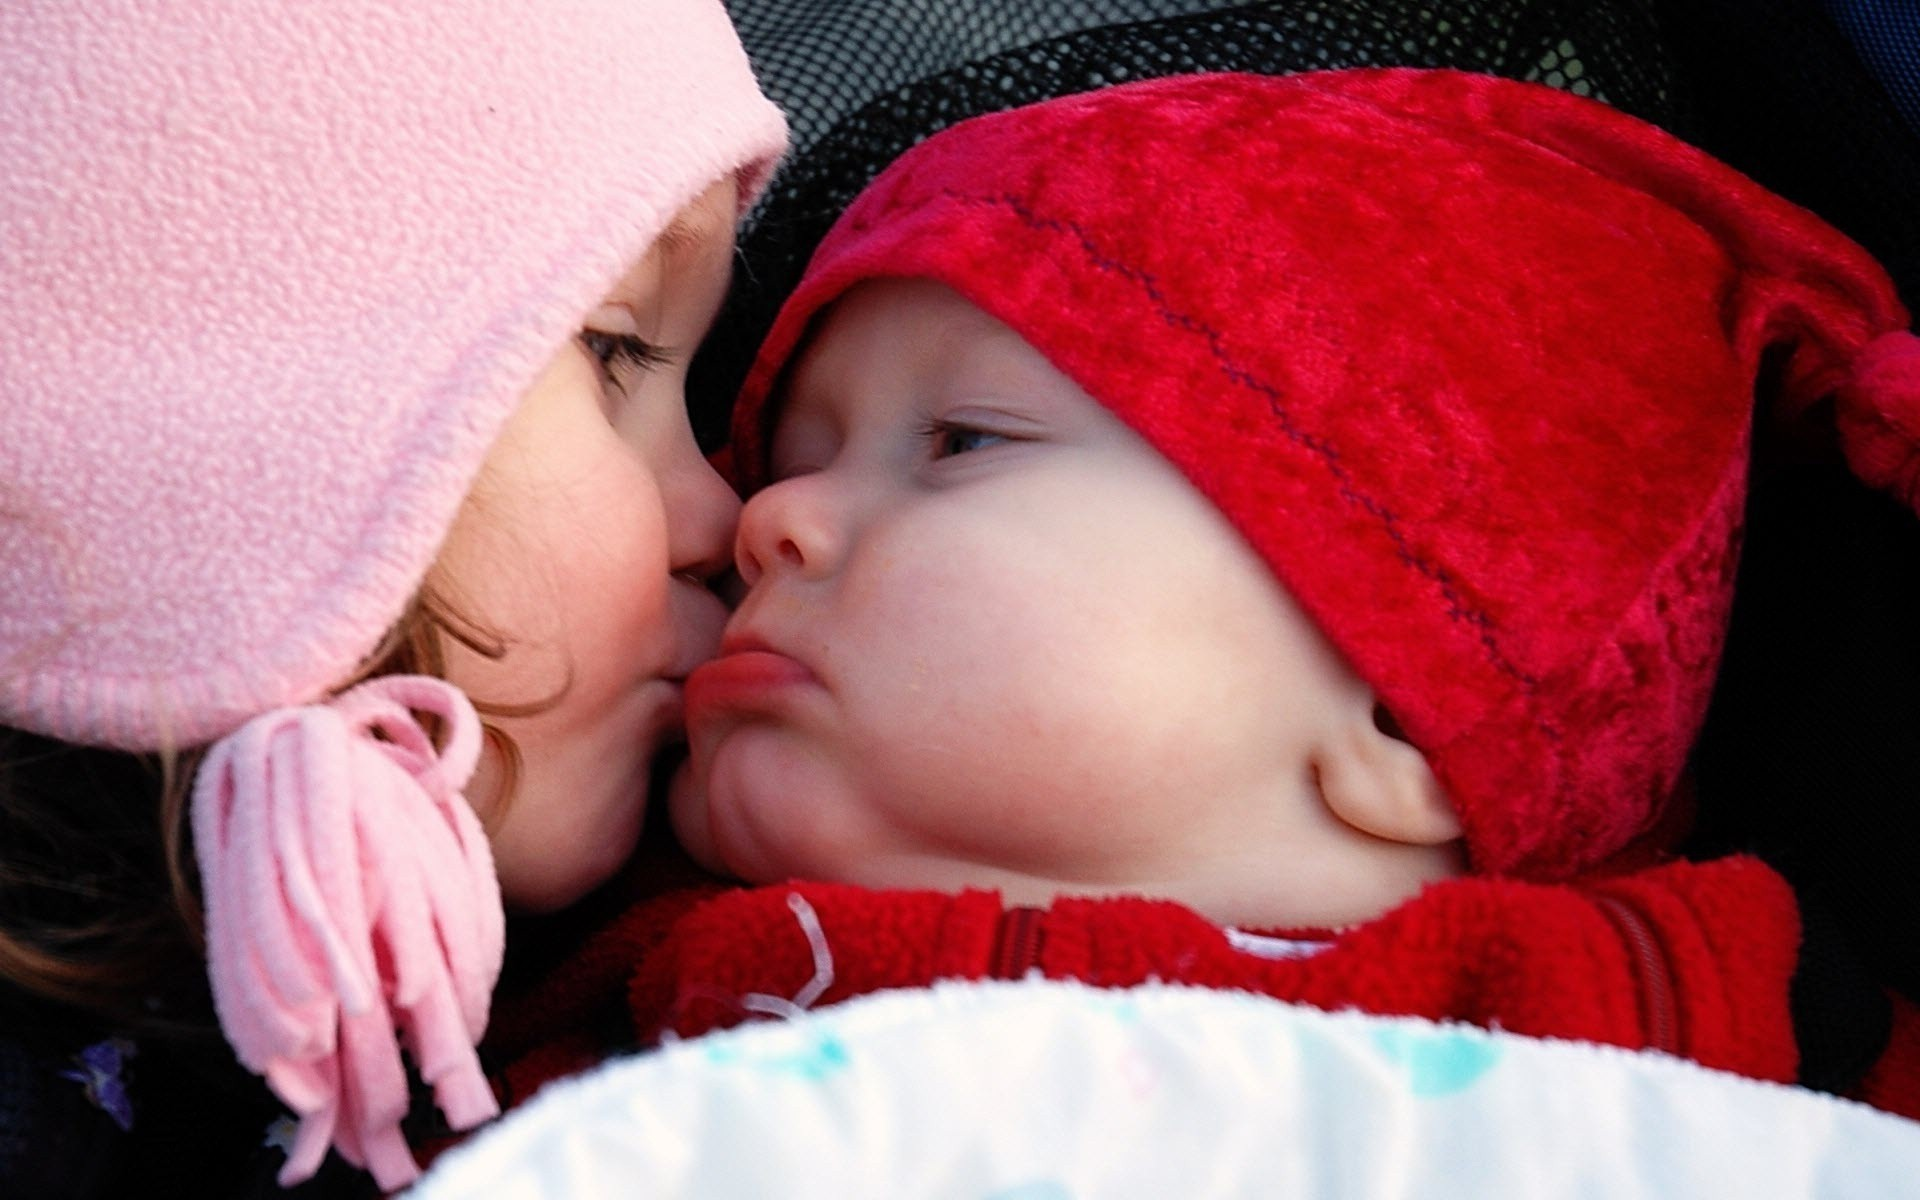 cute baby image wallpaper download